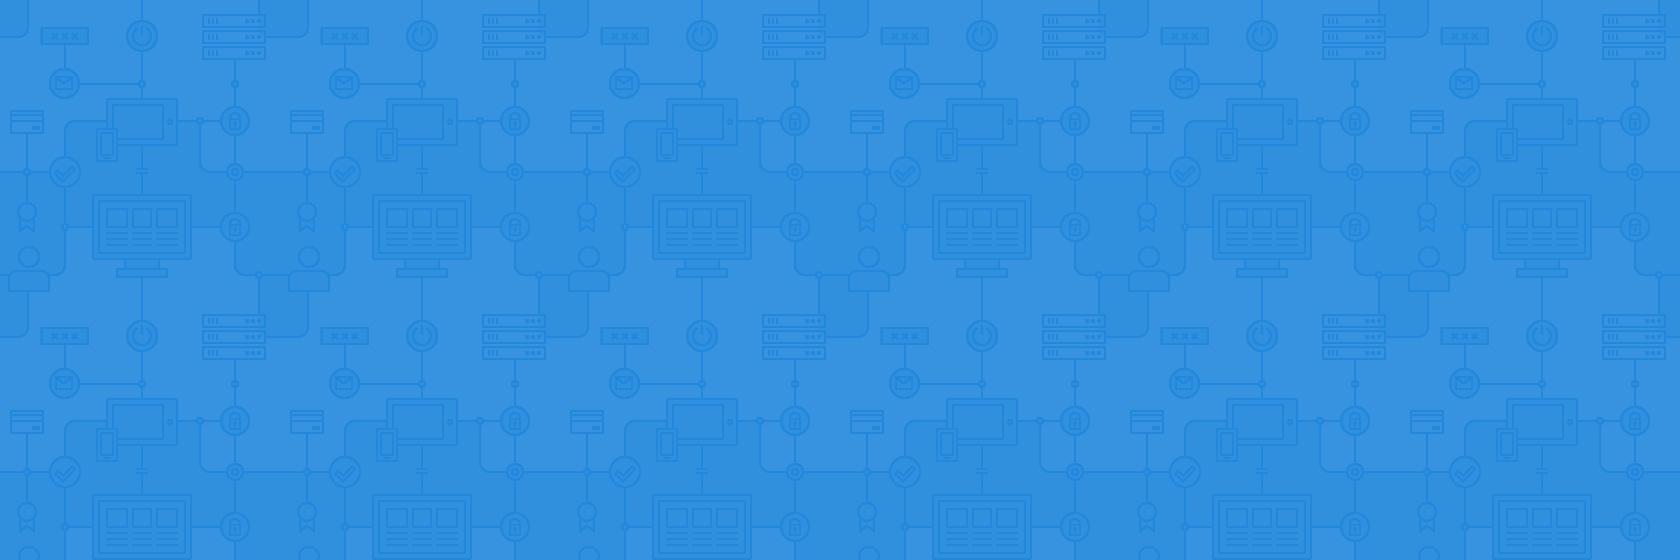 technology-background